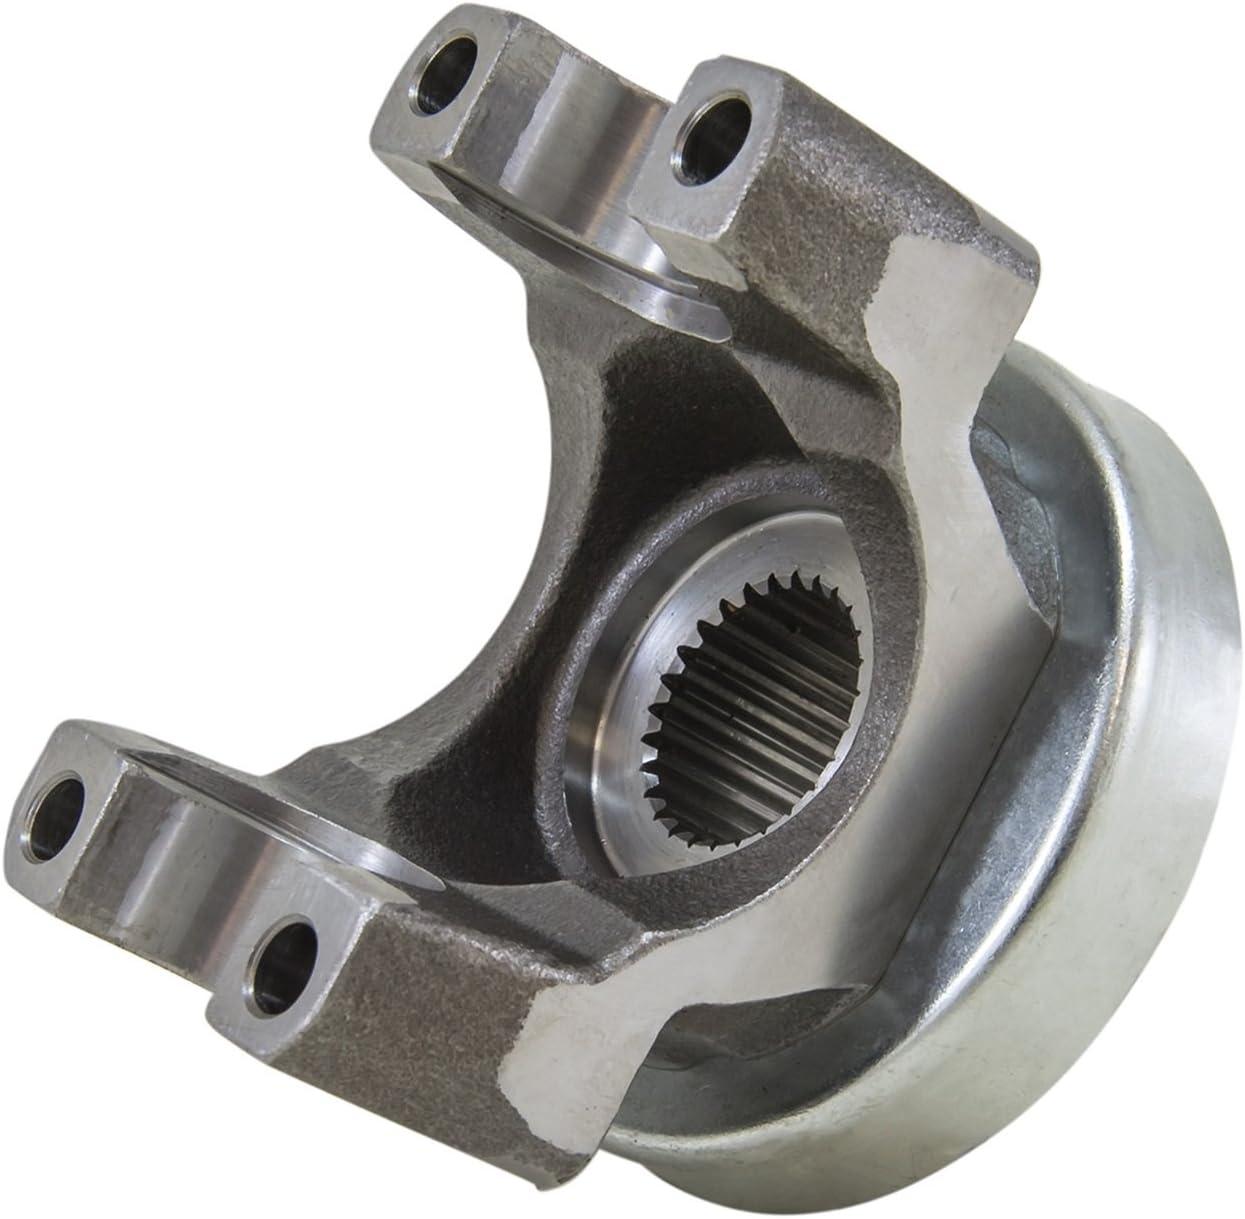 mech 3R 27 Spline in a triple lip design Yoke for GM 7.5 /& GM 7.625 Differential YY GM7827670 Yukon Gear /& Axle